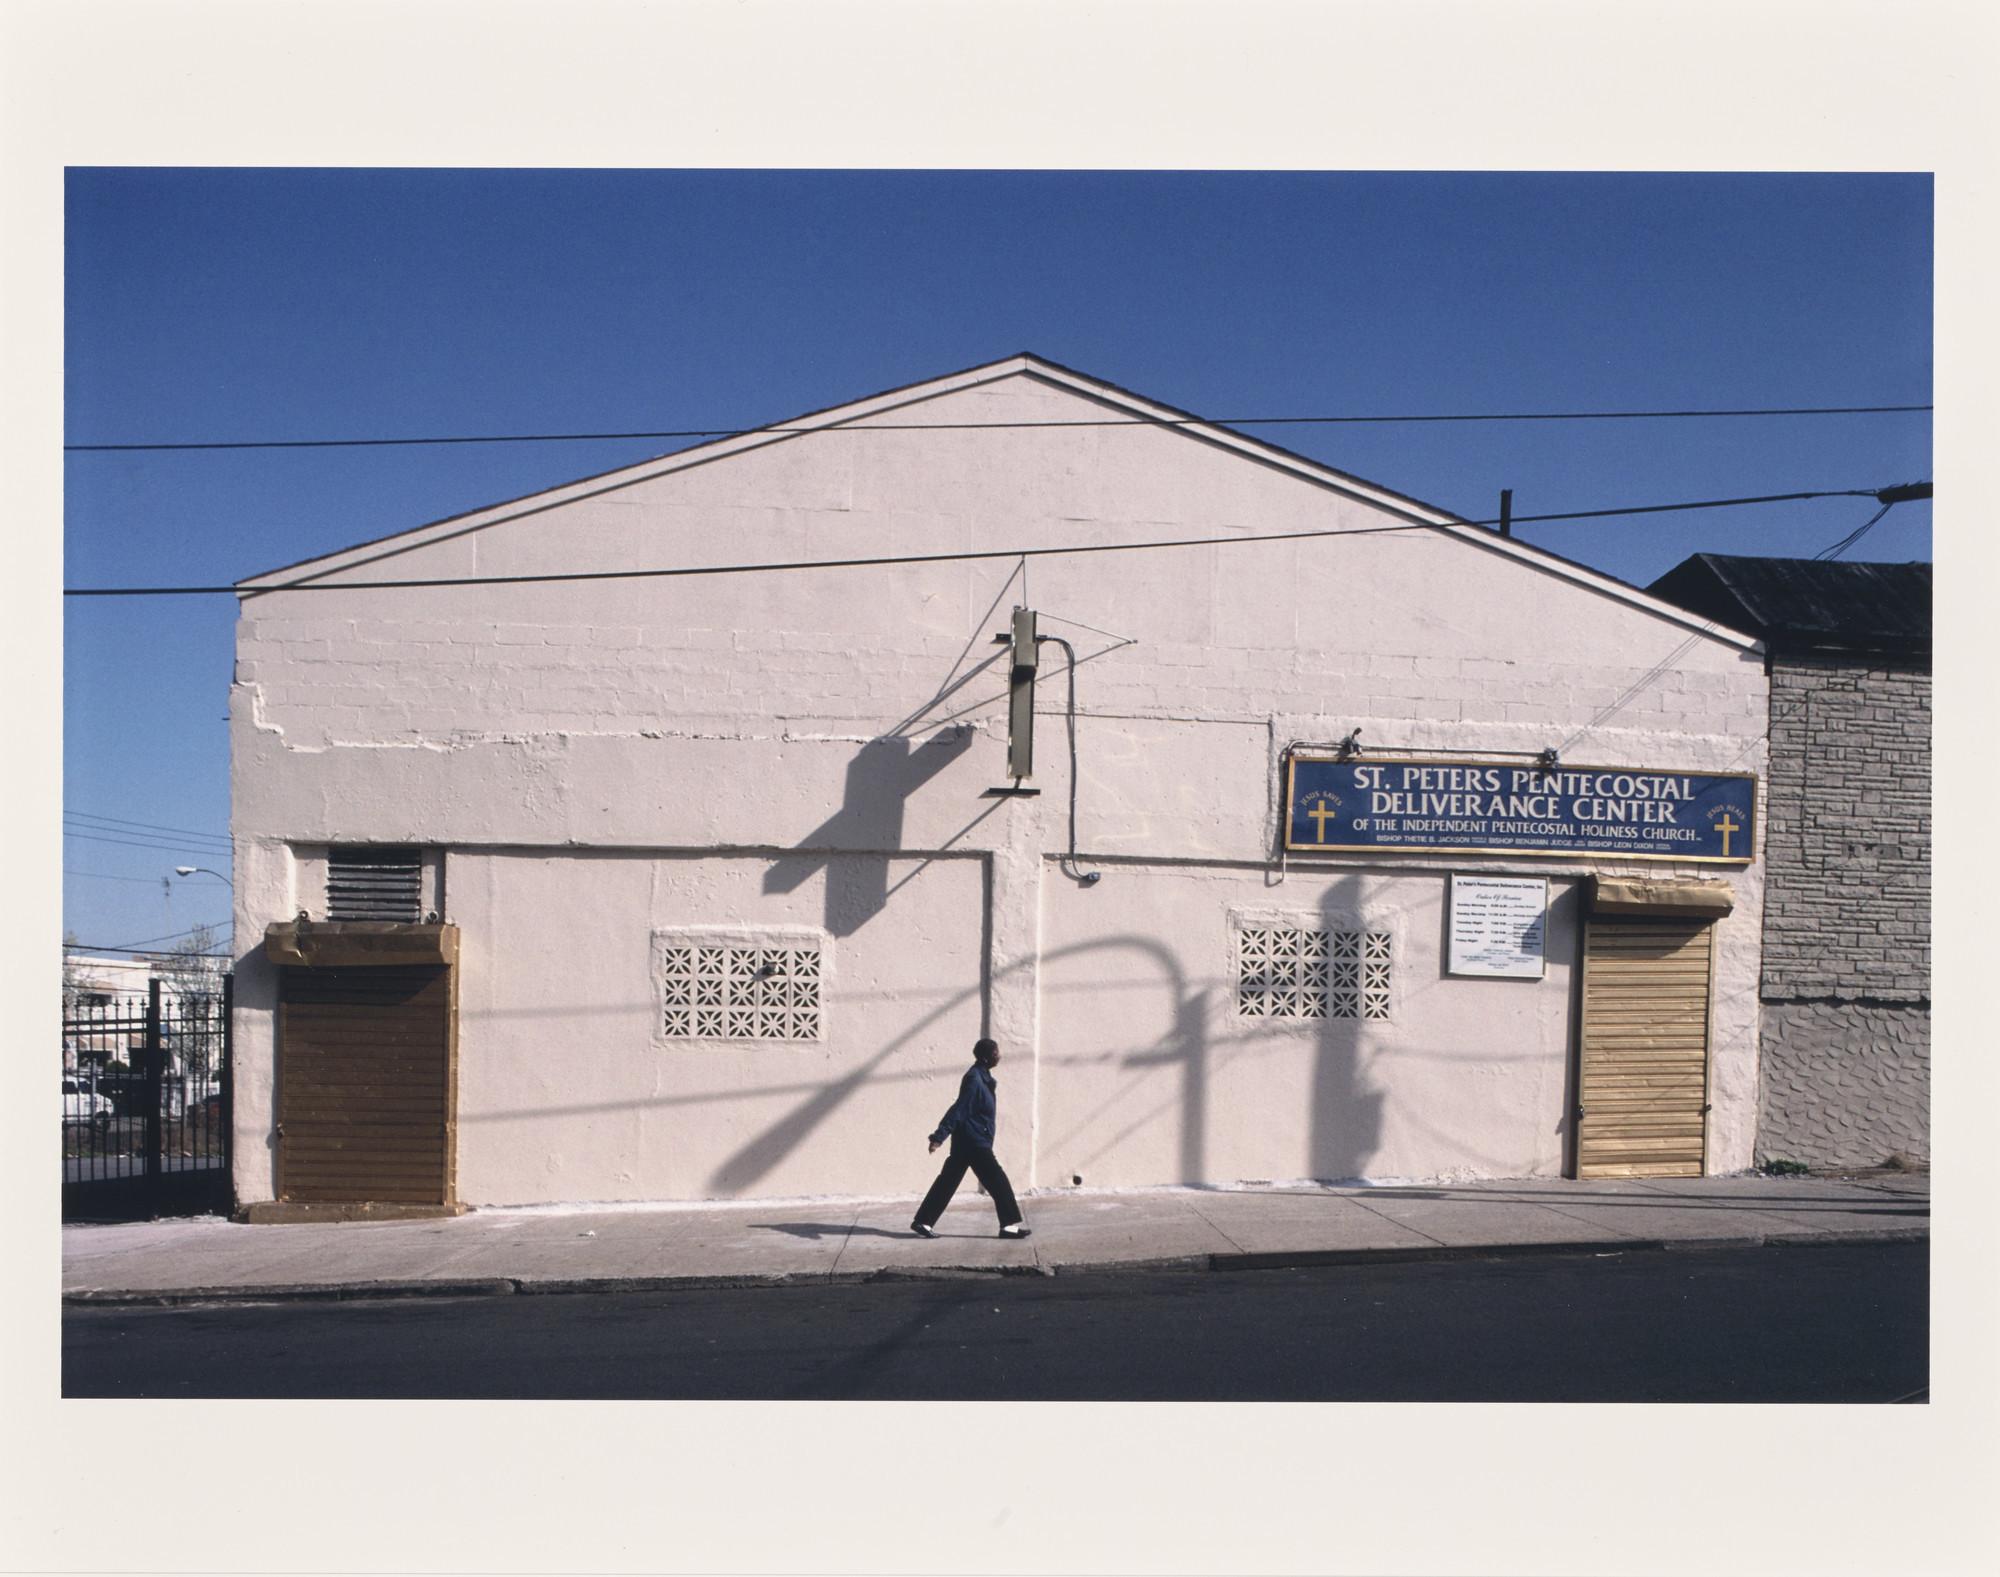 "Camilo José Vergara's ""Saint Peter's Pentecostal Deliverance Center, 937 Home Street, South Bronx, 2002."""